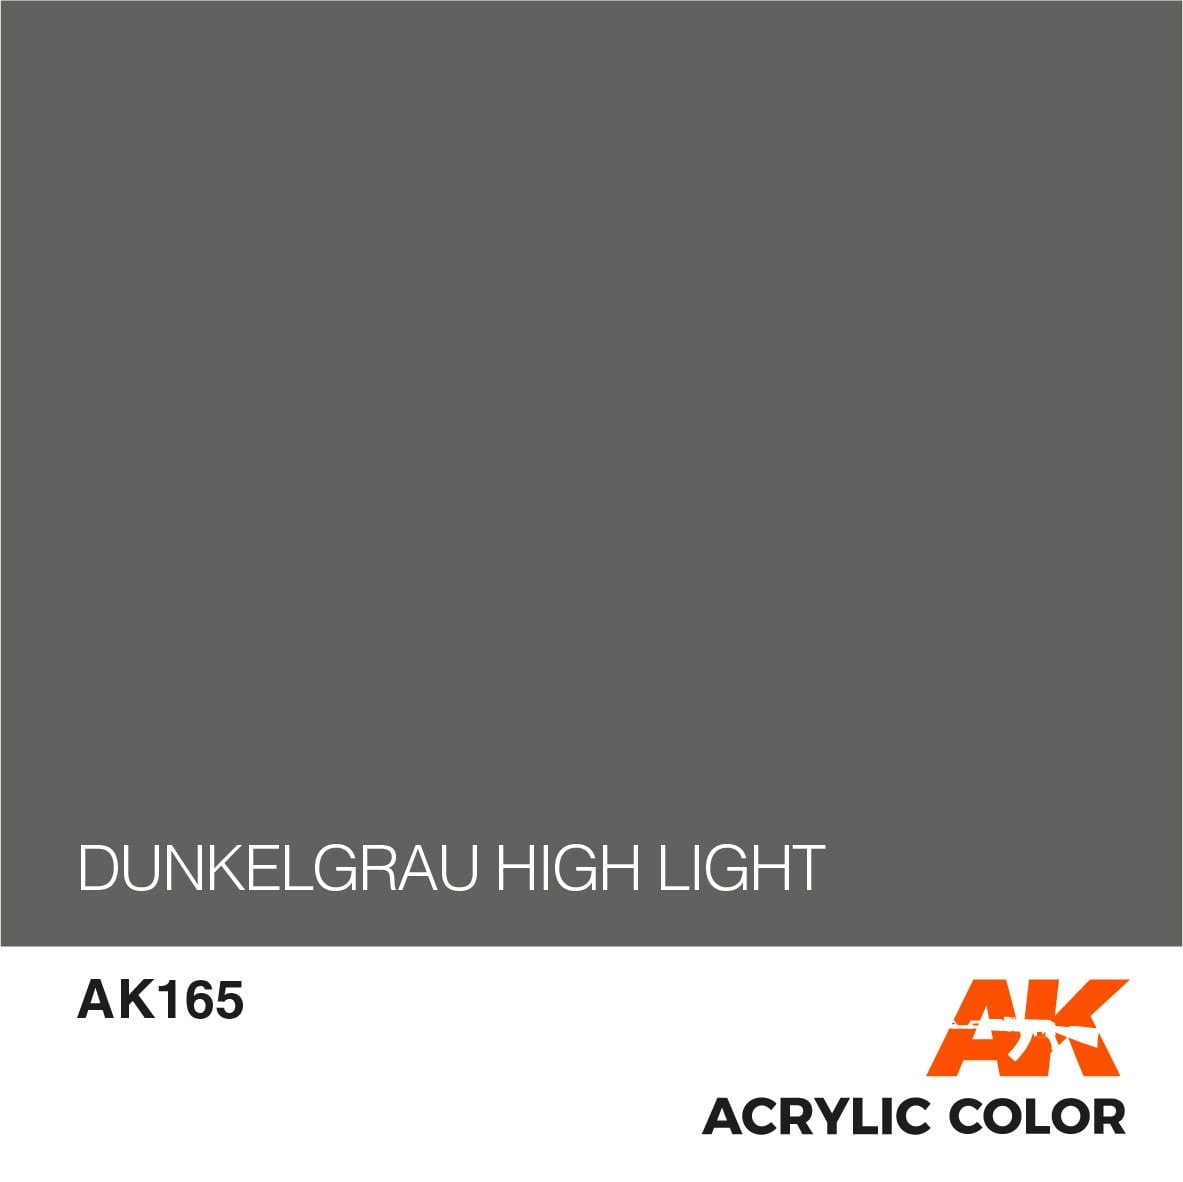 AK-Interactive Dunkelgrau High Lights - 17ml - AK-Interactive - AK-165